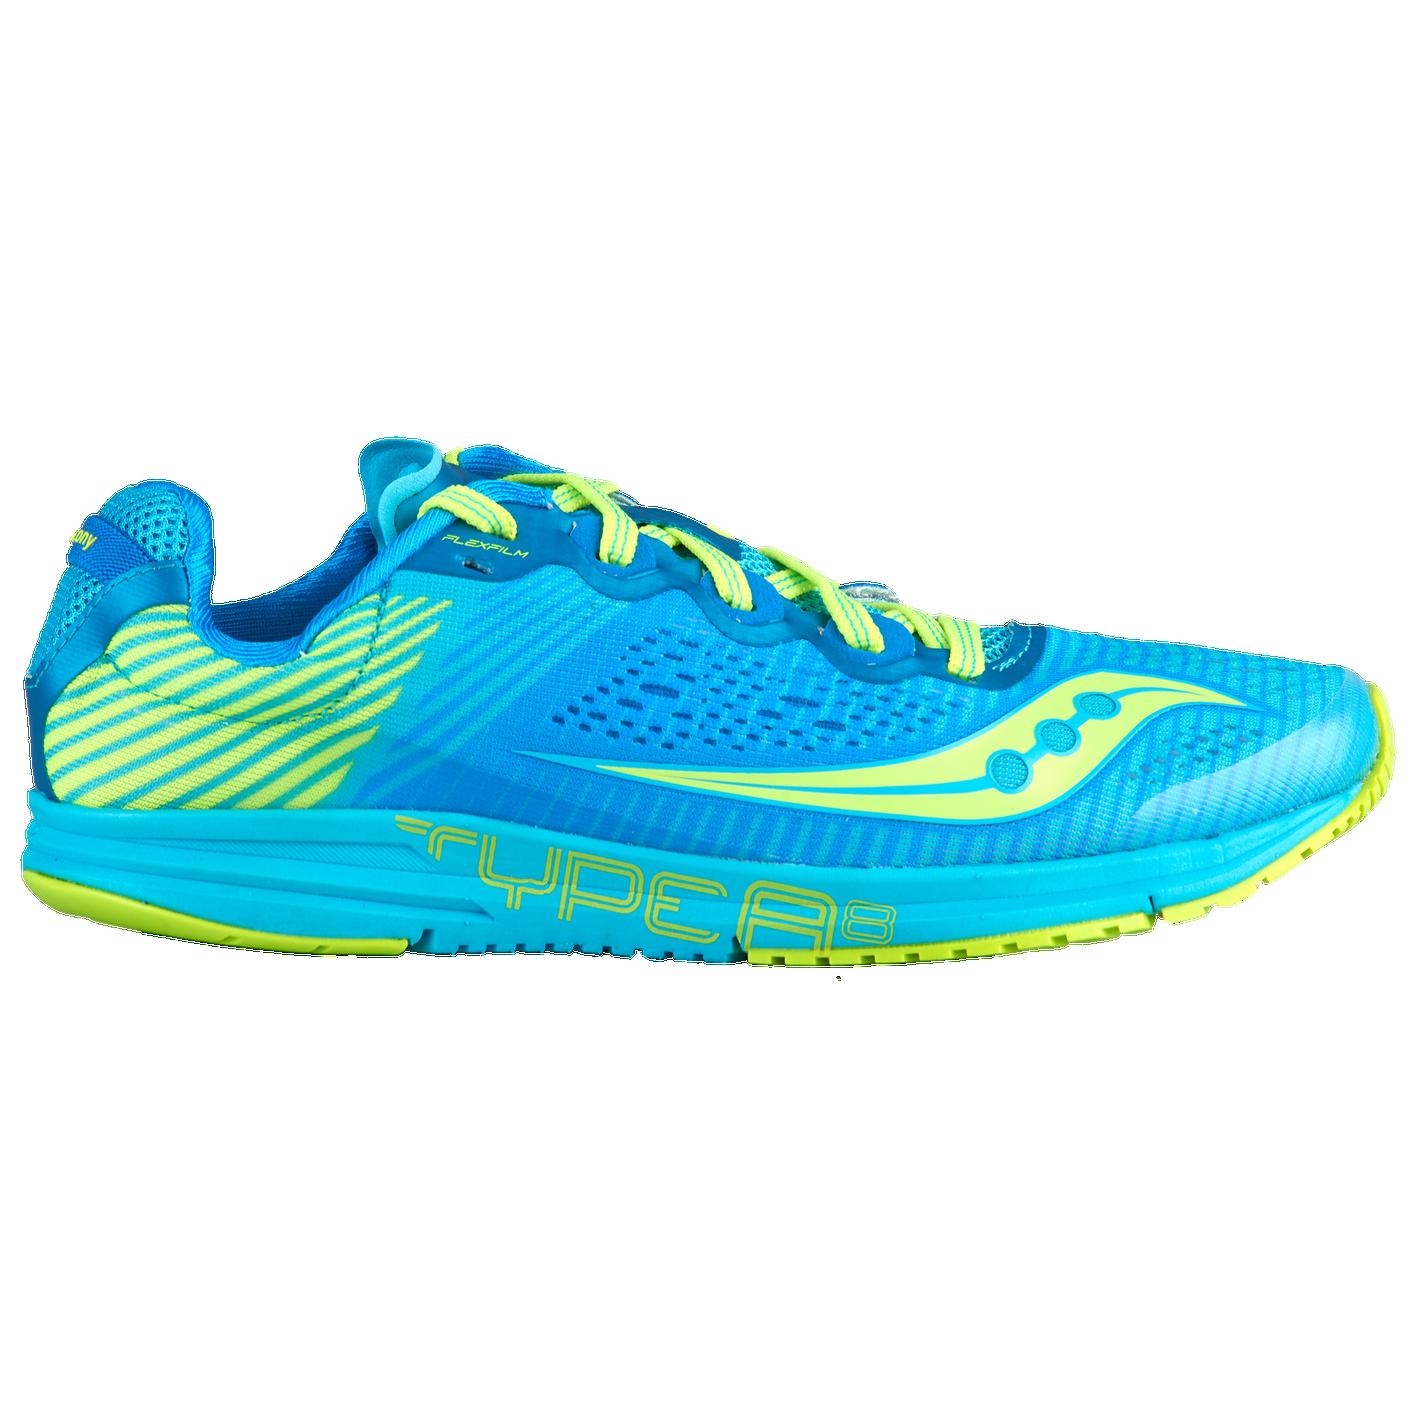 63f27b78 Saucony Type A8 - Women's - Track & Field - Shoes - Blue/Citron